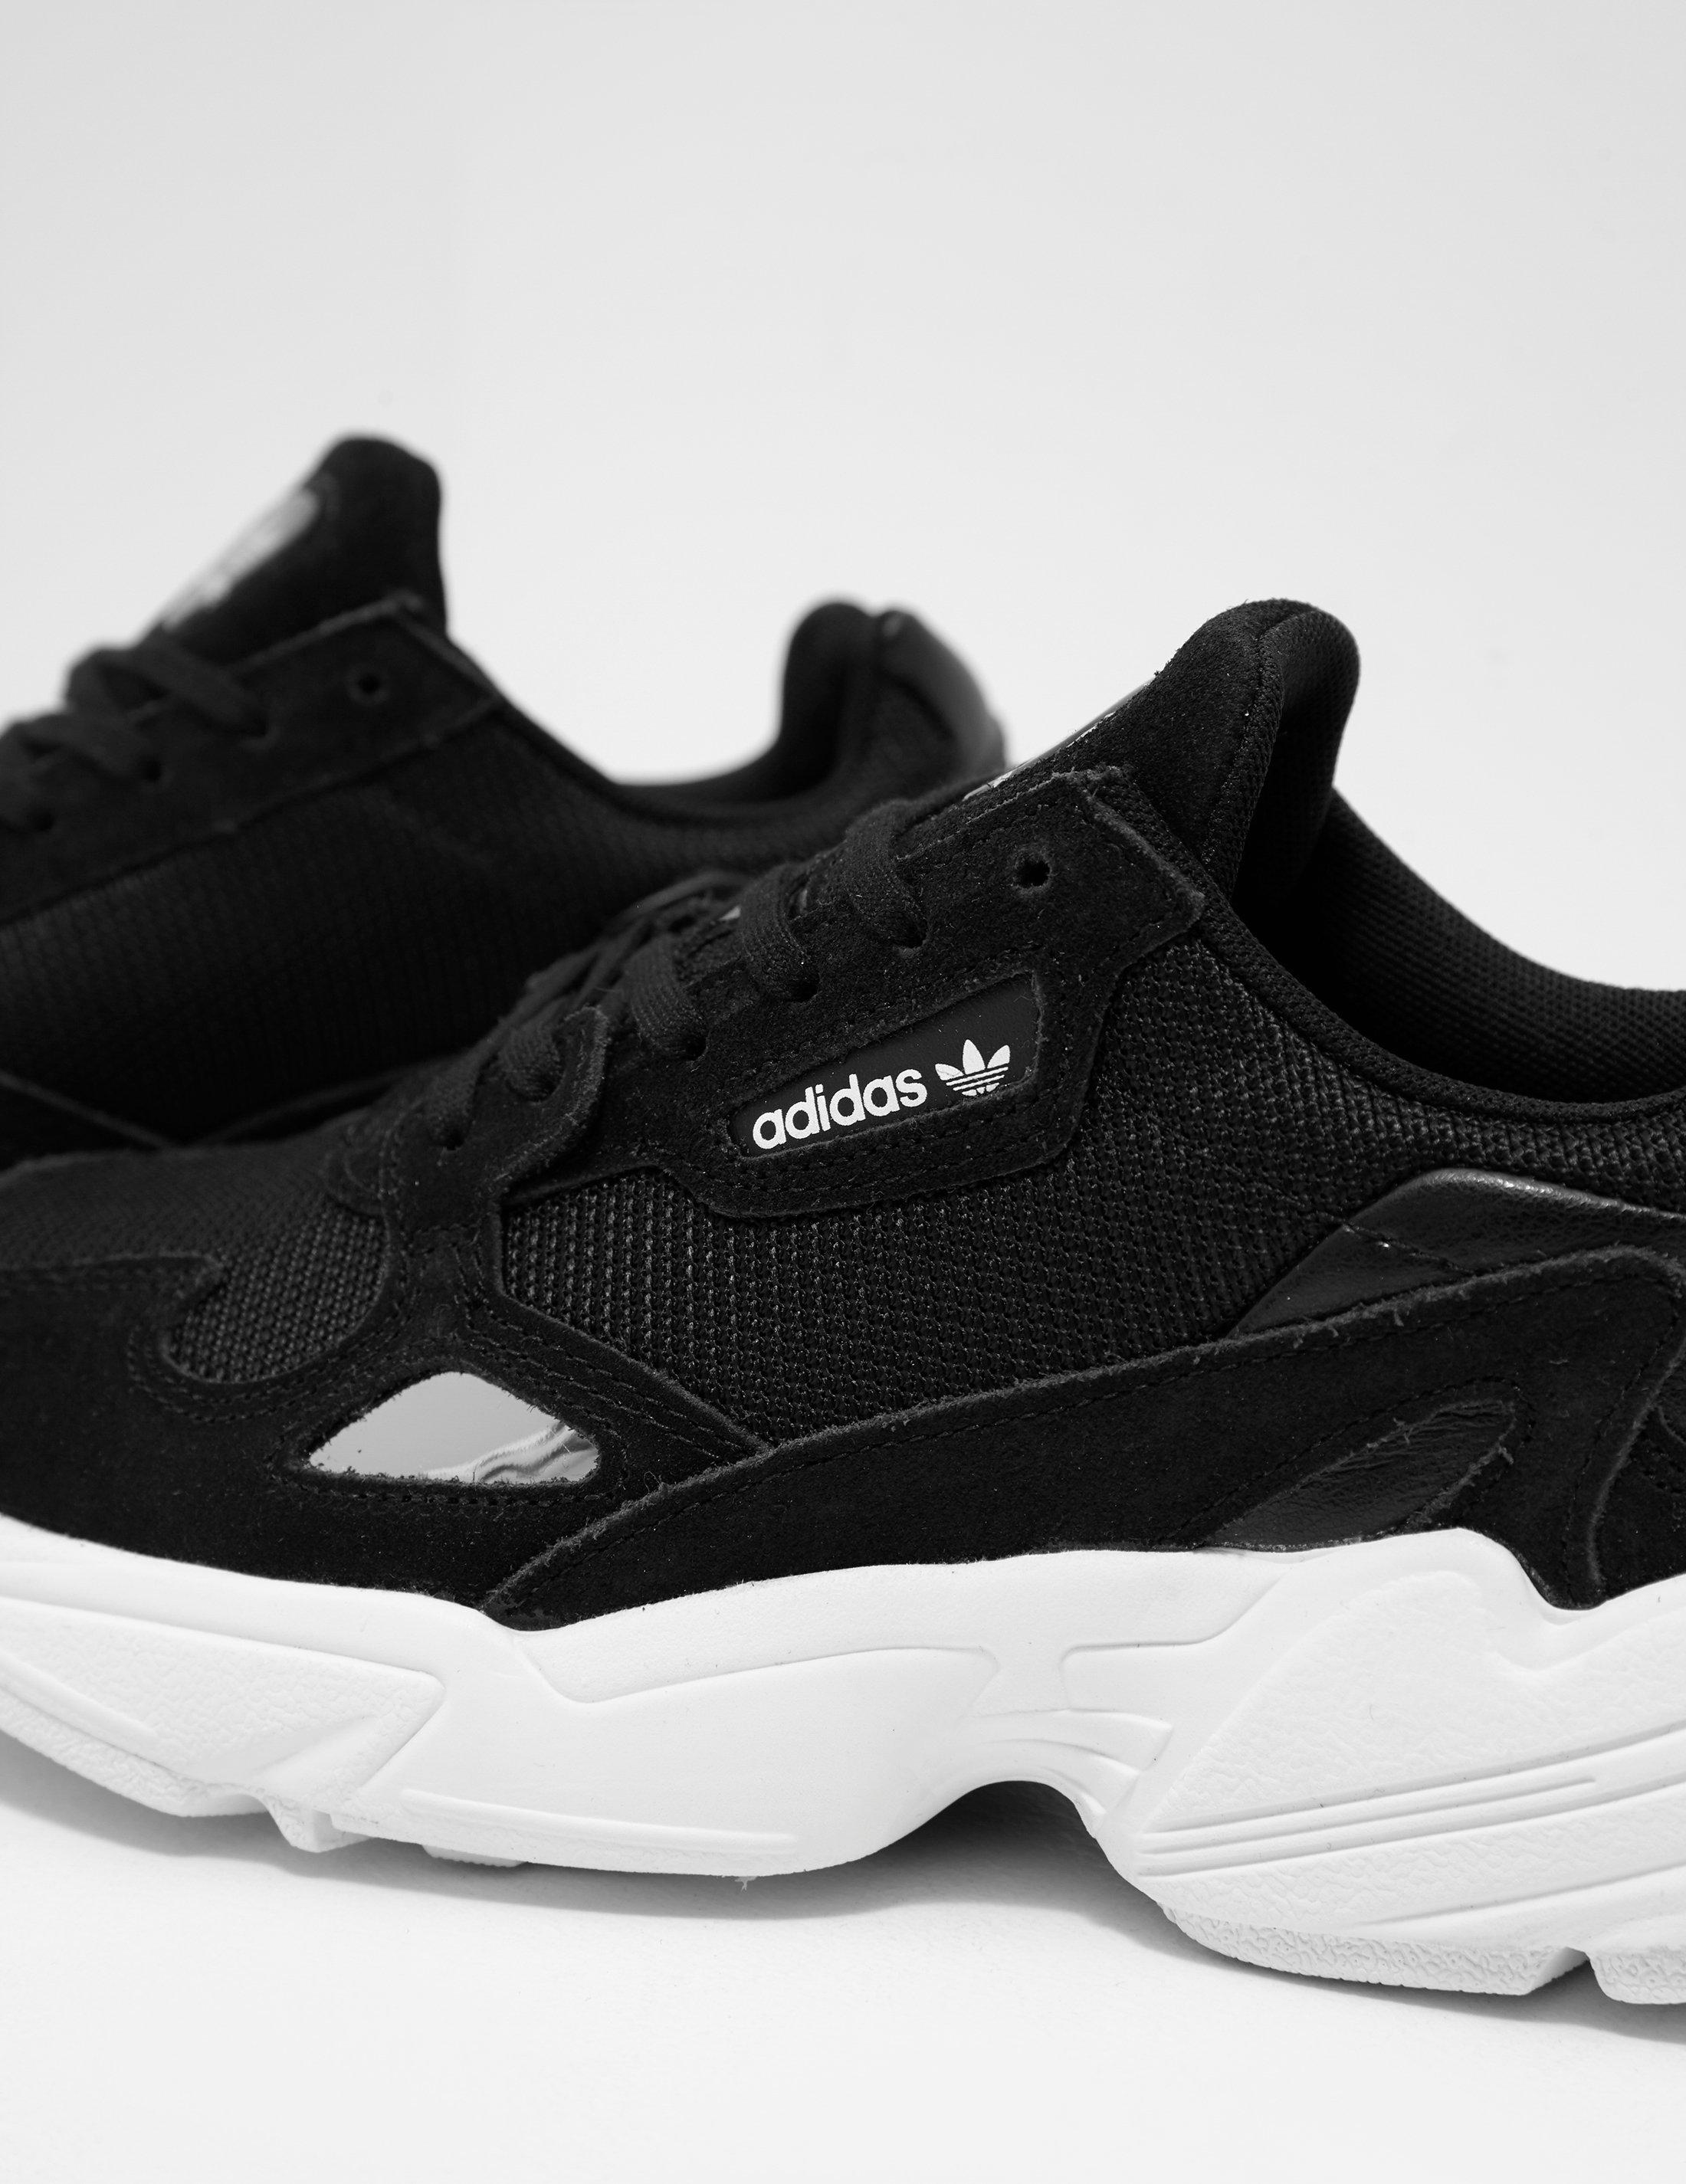 30a10b3e52a Lyst - adidas Originals Womens Falcon Women s Black in Black